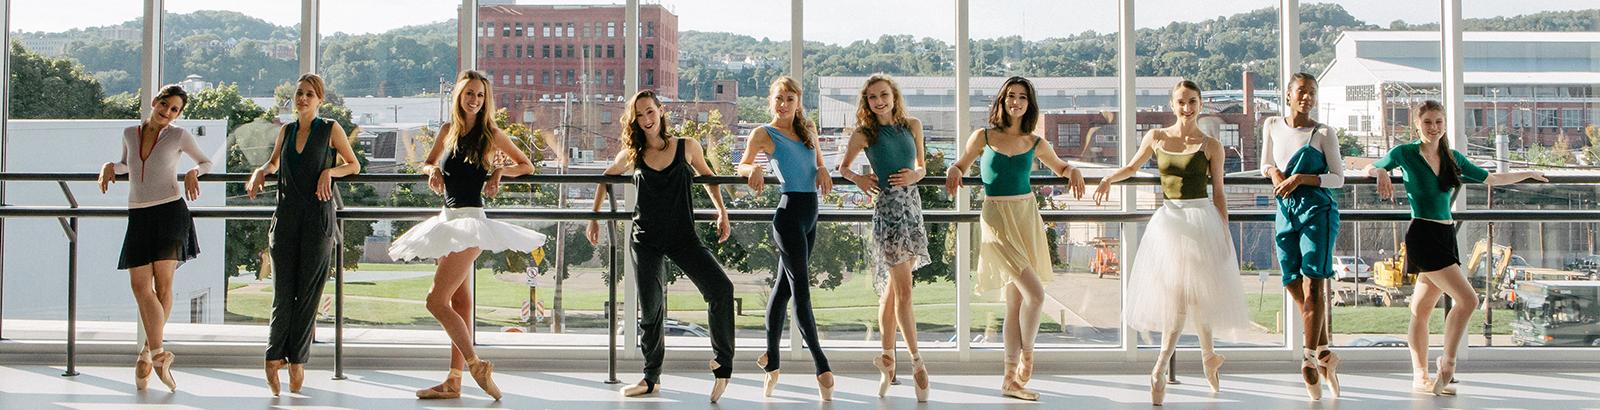 UPMC Team - Pittsburgh Ballet Theatre